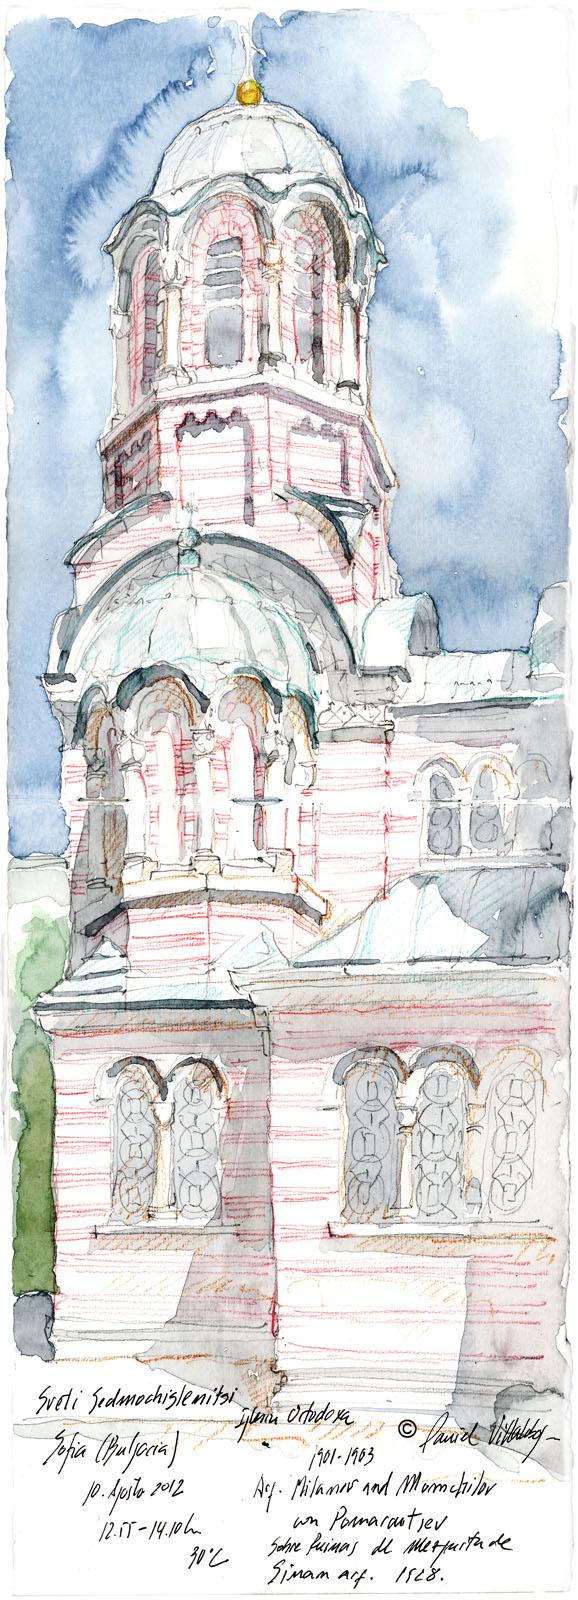 #danielvillalobos #sketch #sketchbook #skechtravel #sofia #svetisedmochislenitsi